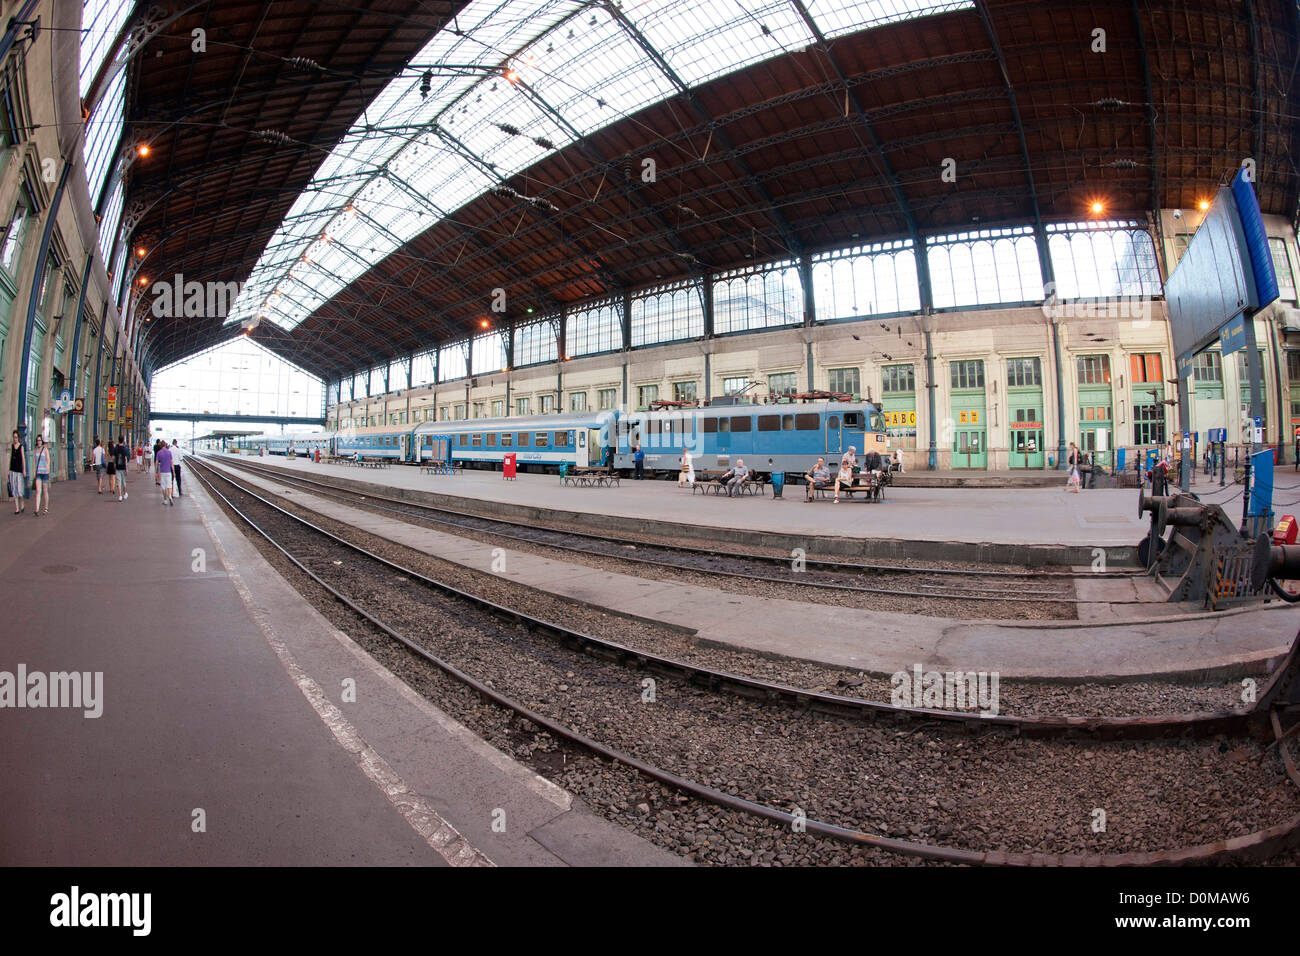 Nyugati train station in Budapest, the capital of Hungary. - Stock Image